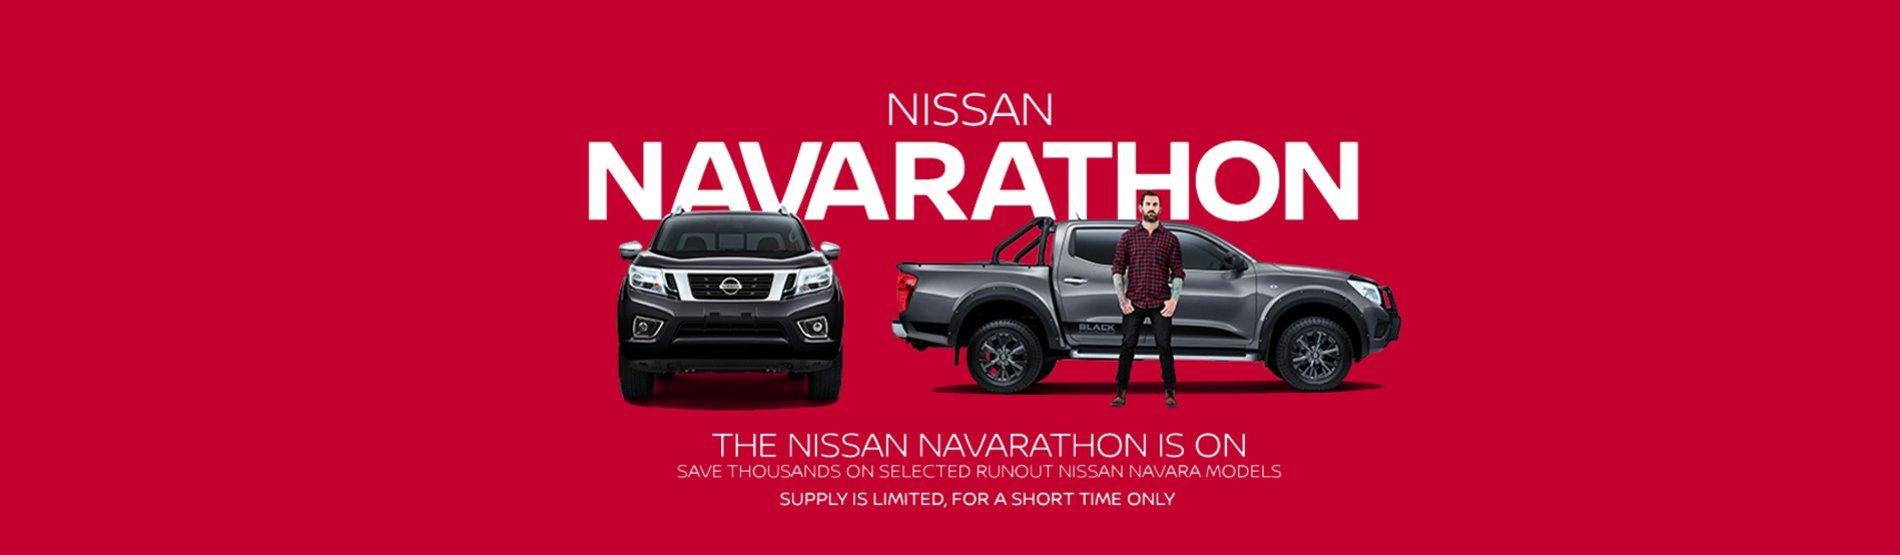 FTG Nissan Navarathon